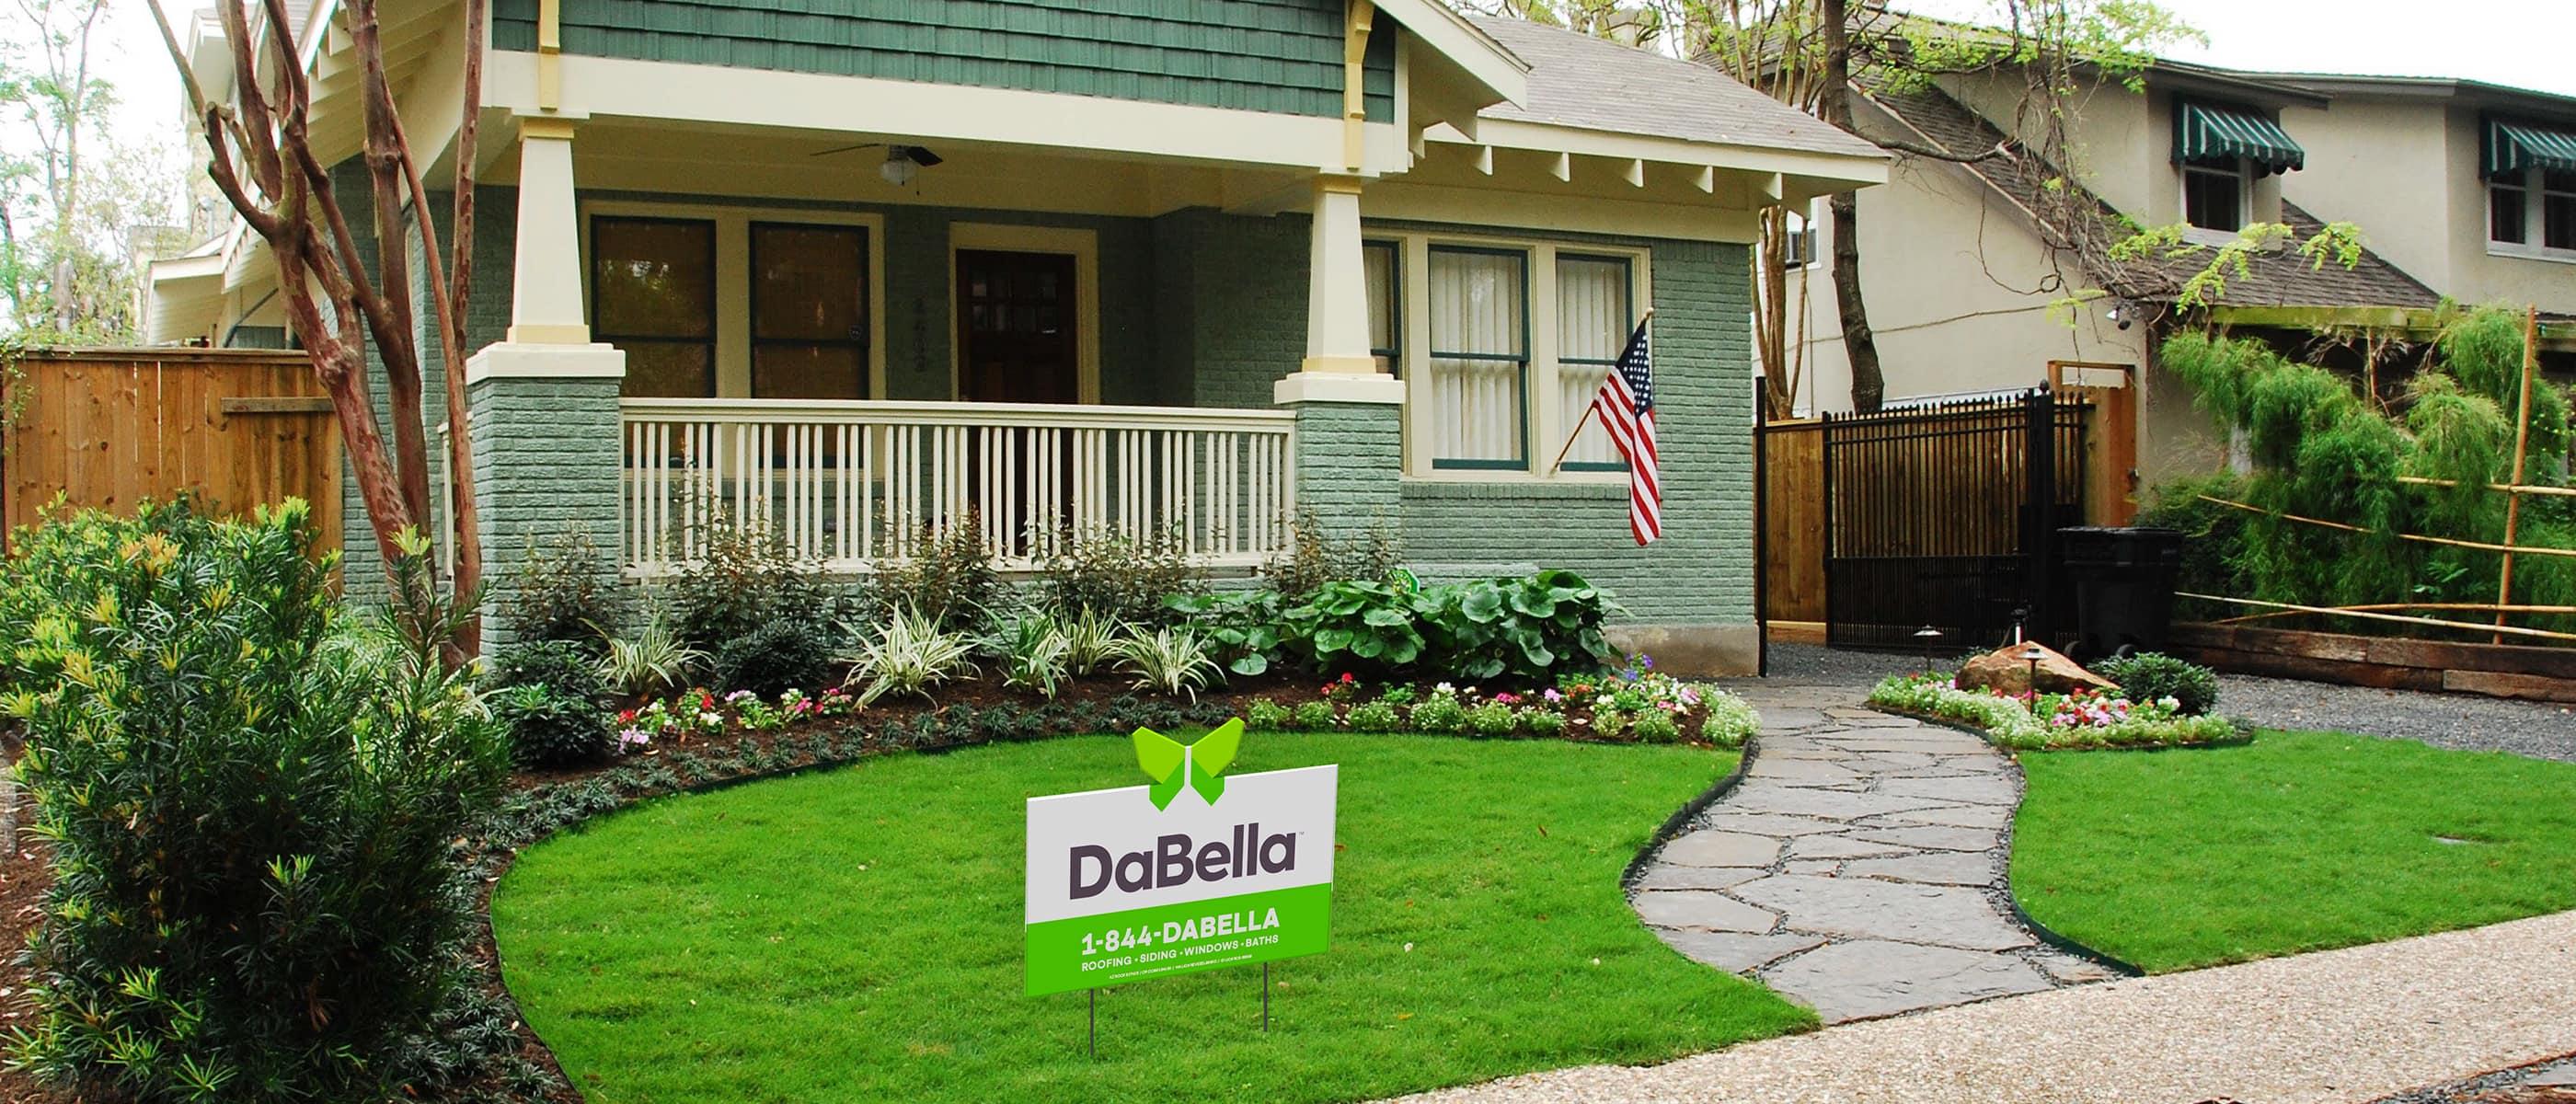 Dabella yard sign